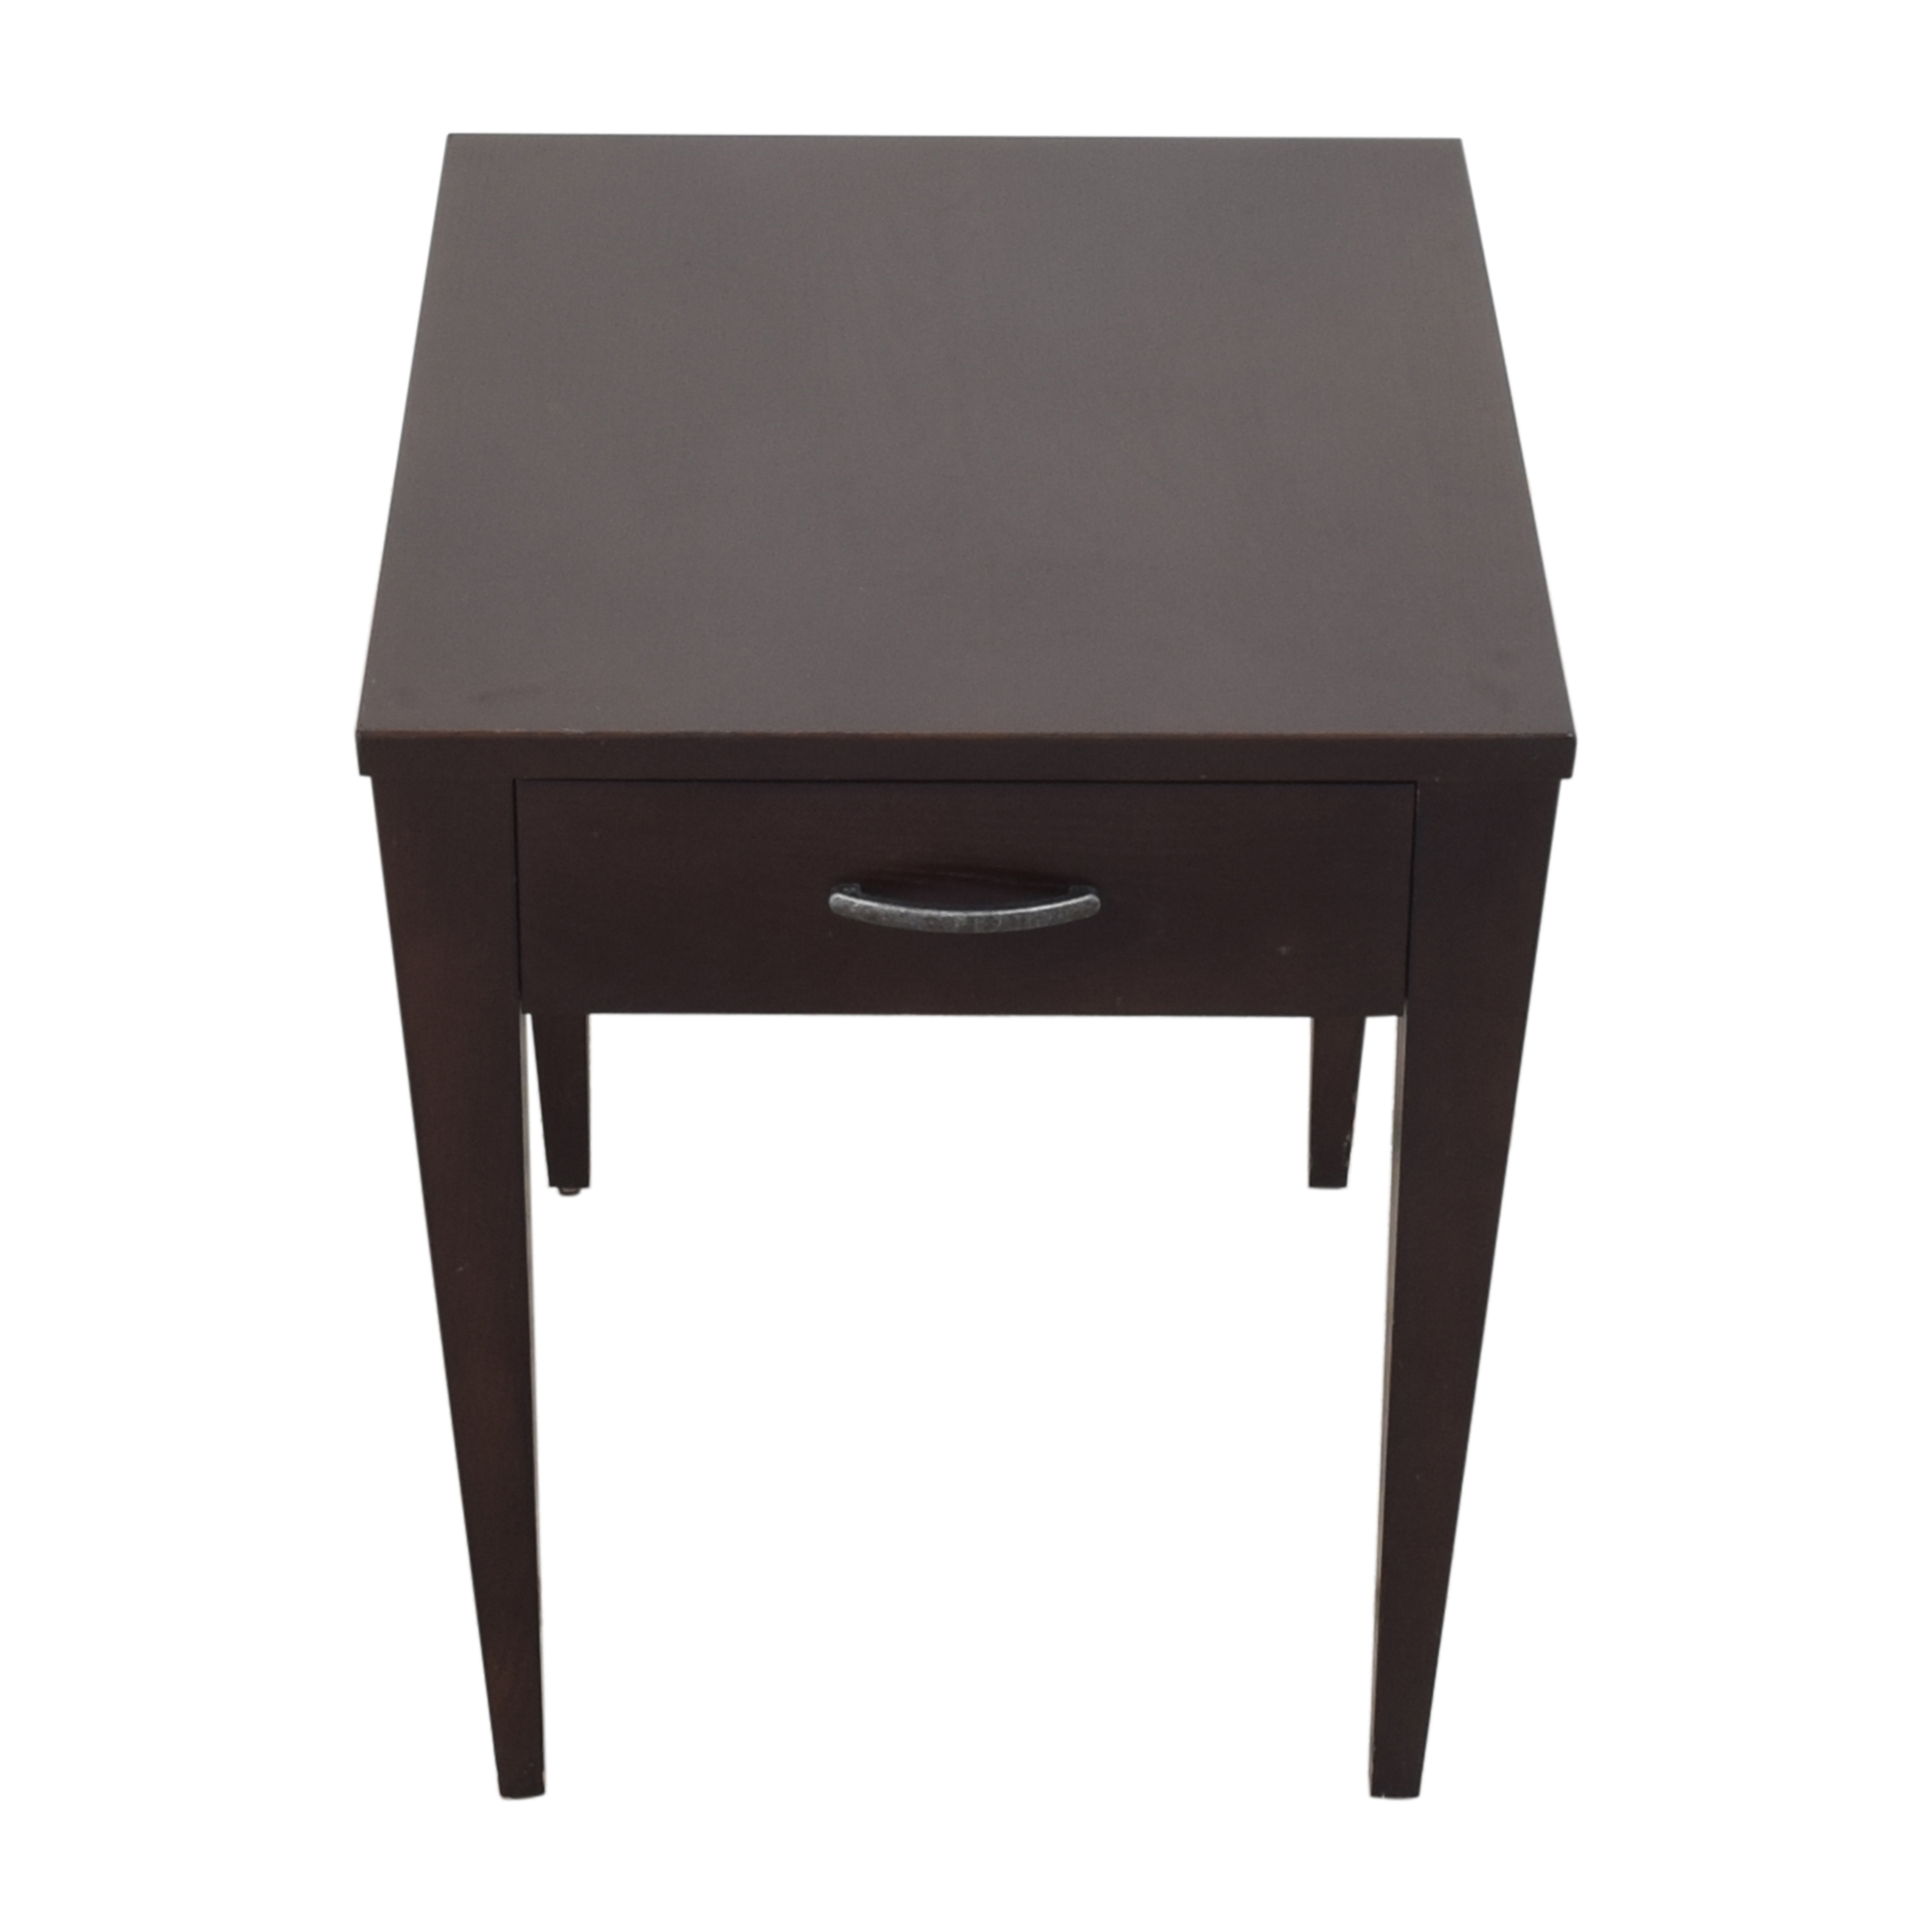 Ethan Allen Ethan Allen Single Drawer End Table pa